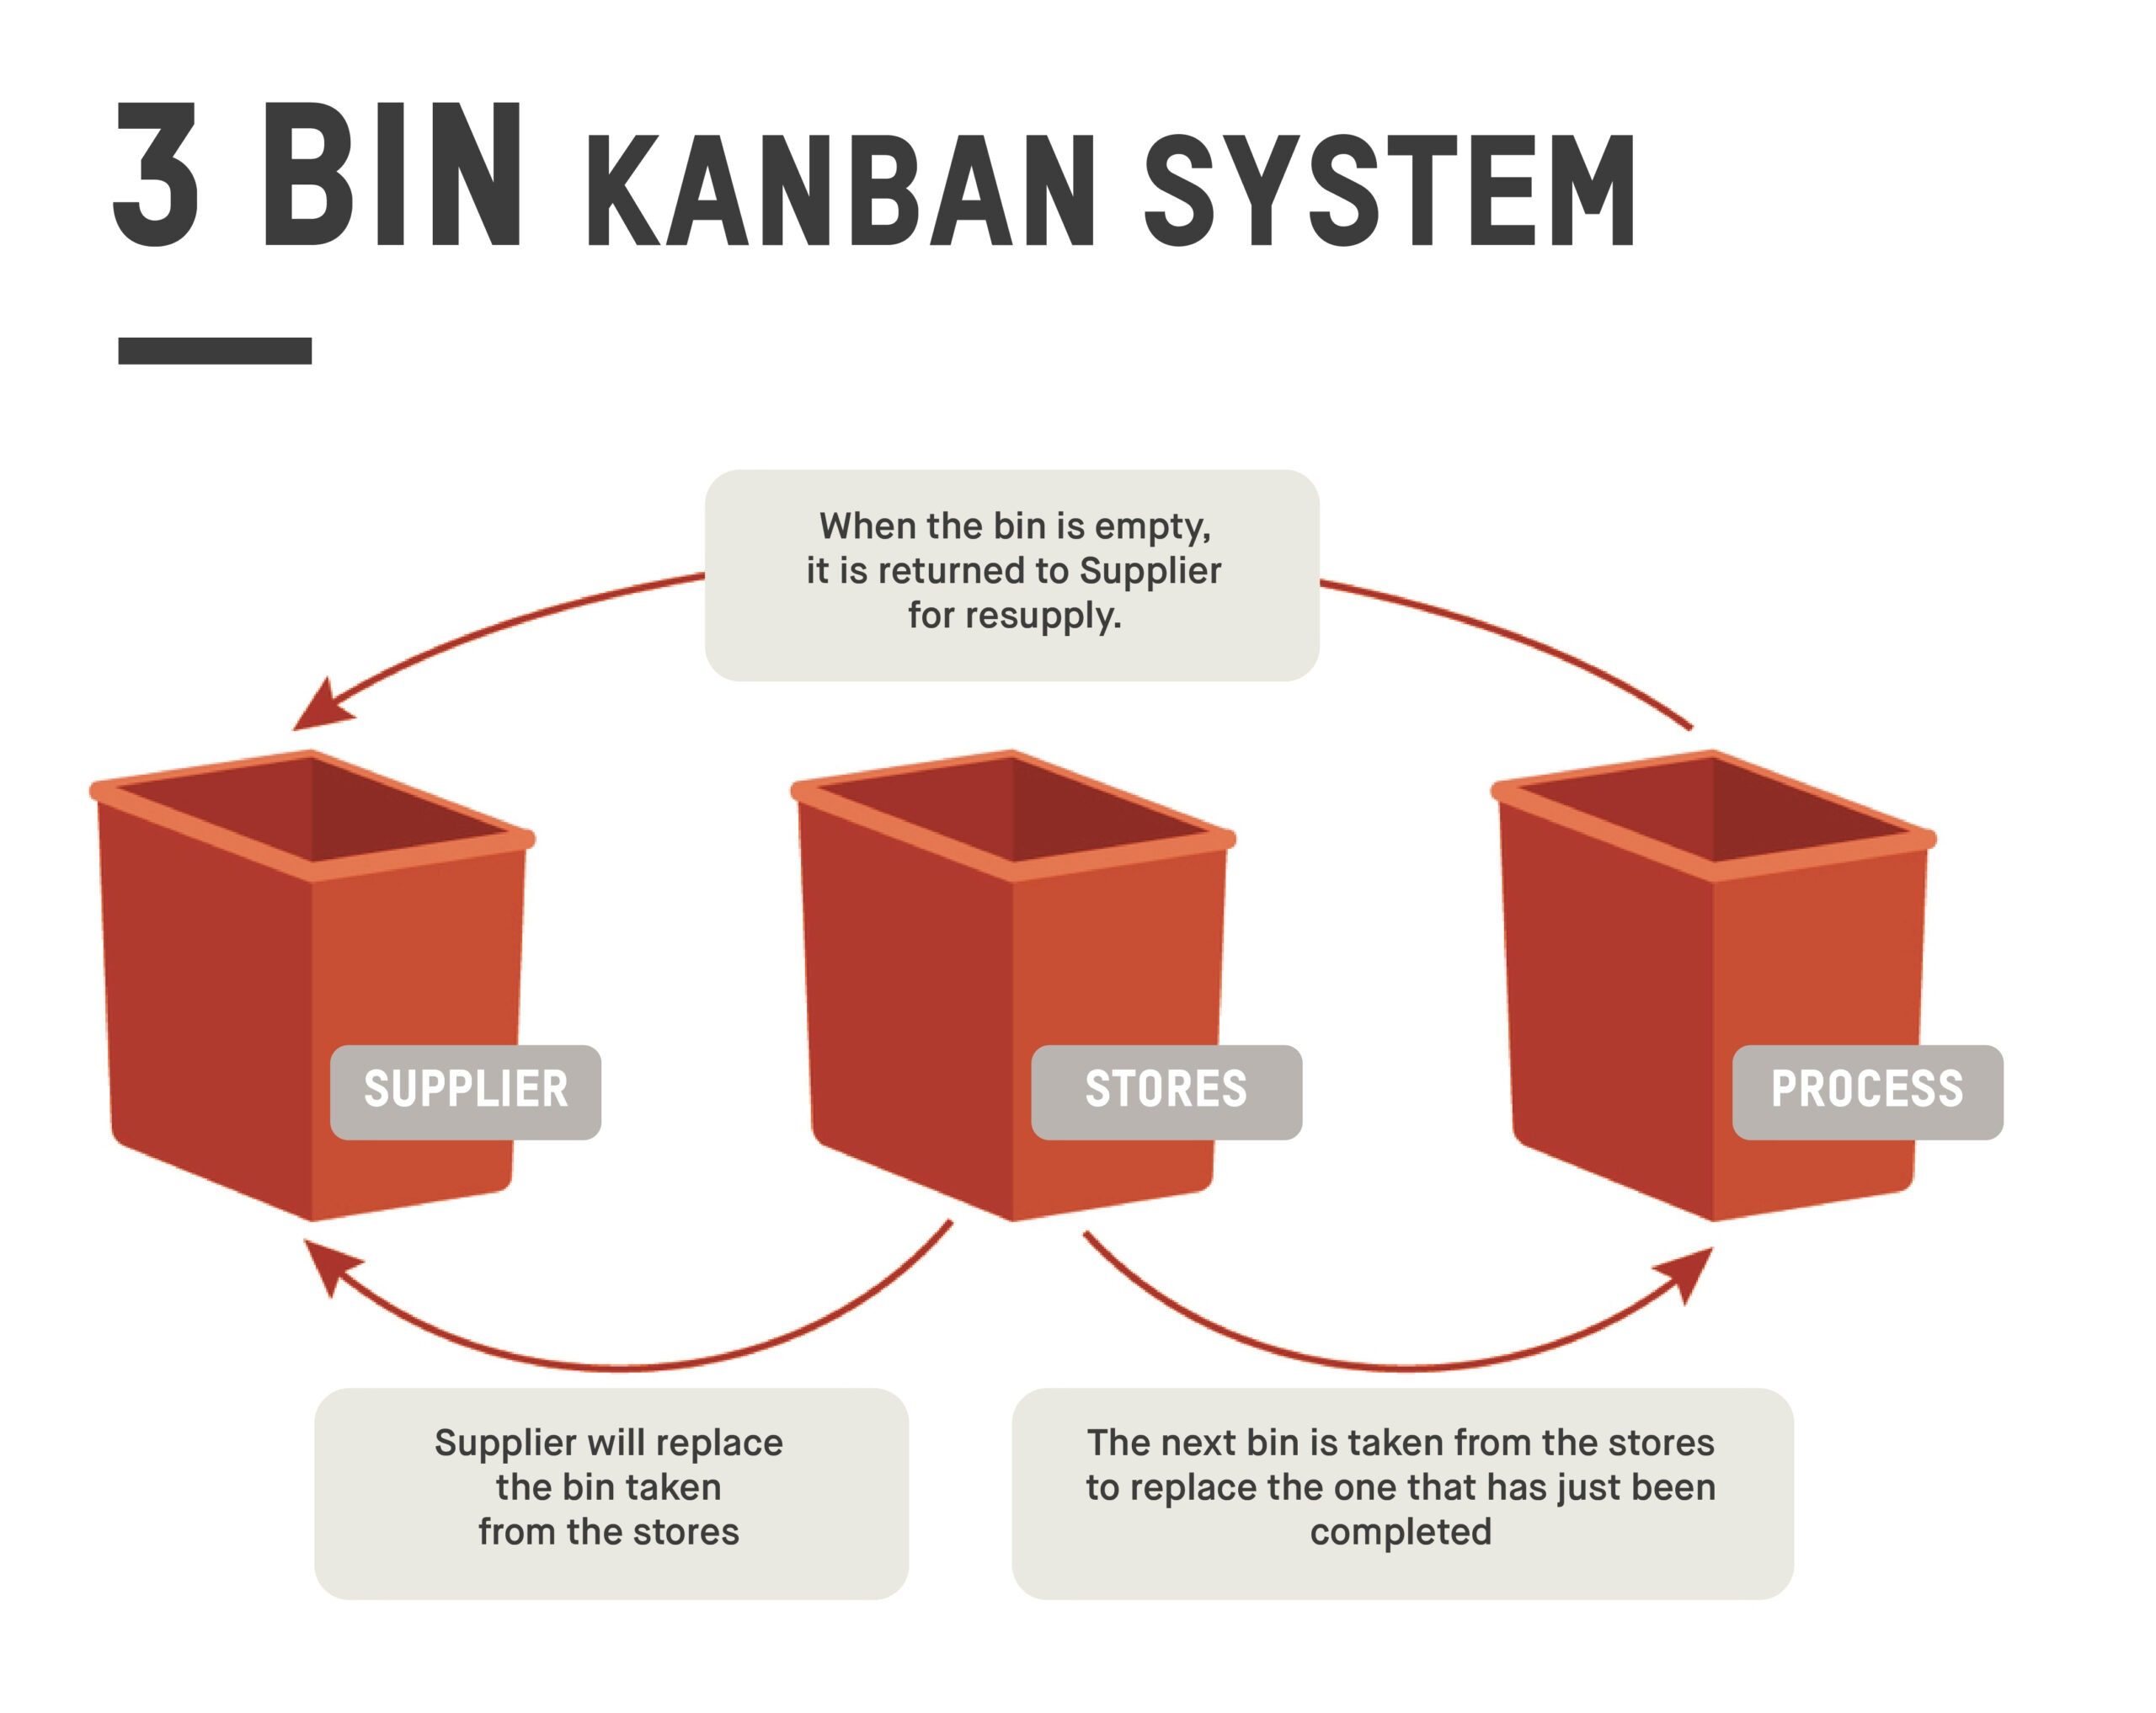 The traditional three-bin kanban system